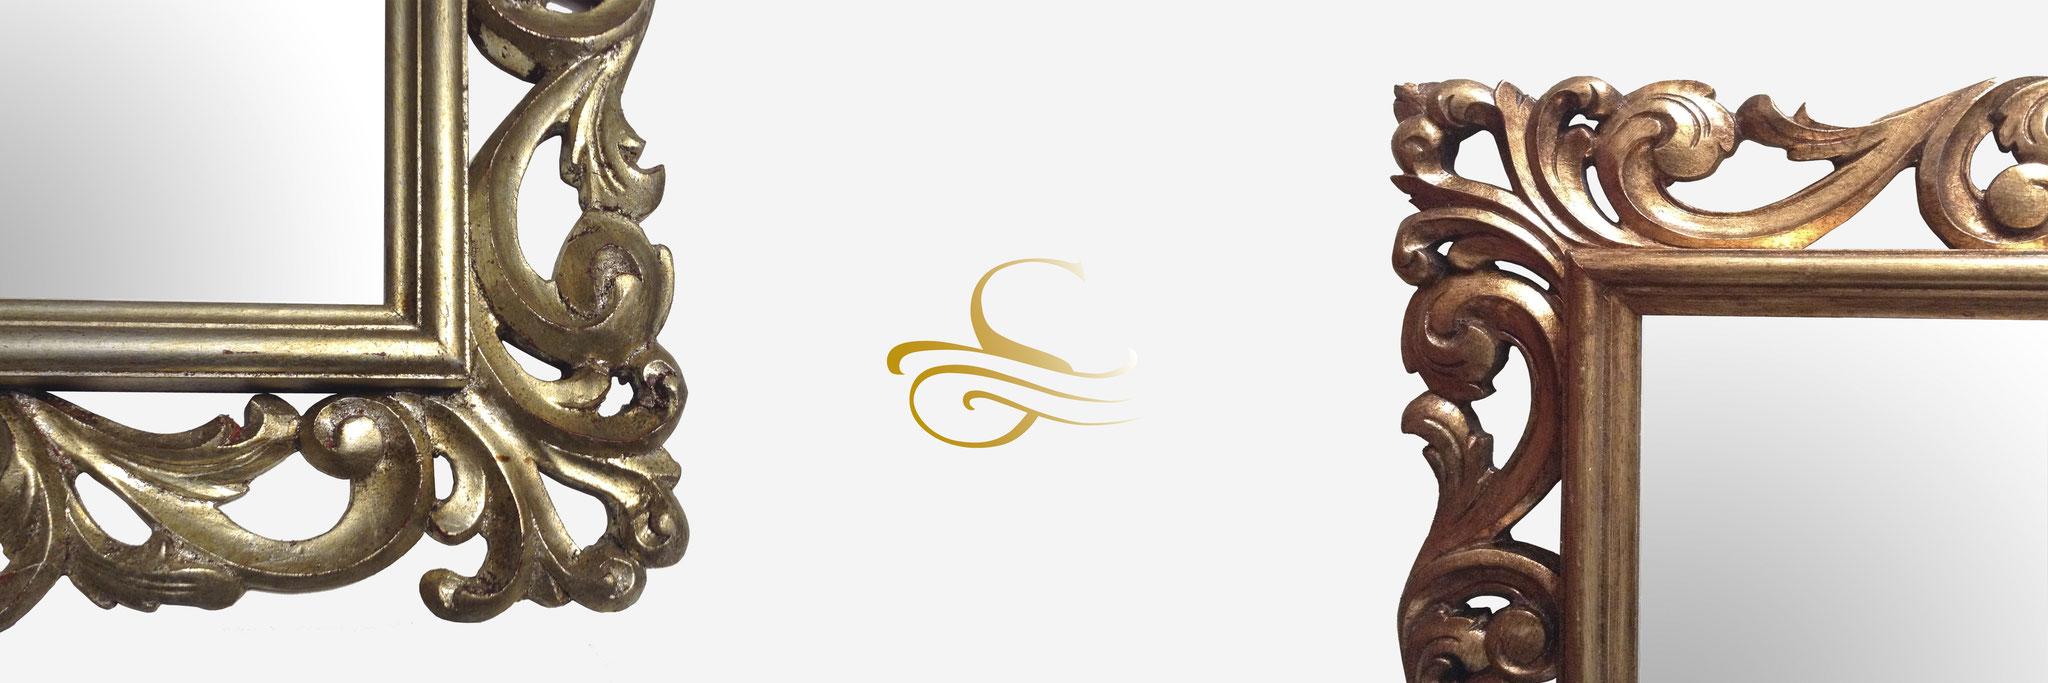 1bad21c0 Empresa - Muebles Artesania Salamanca